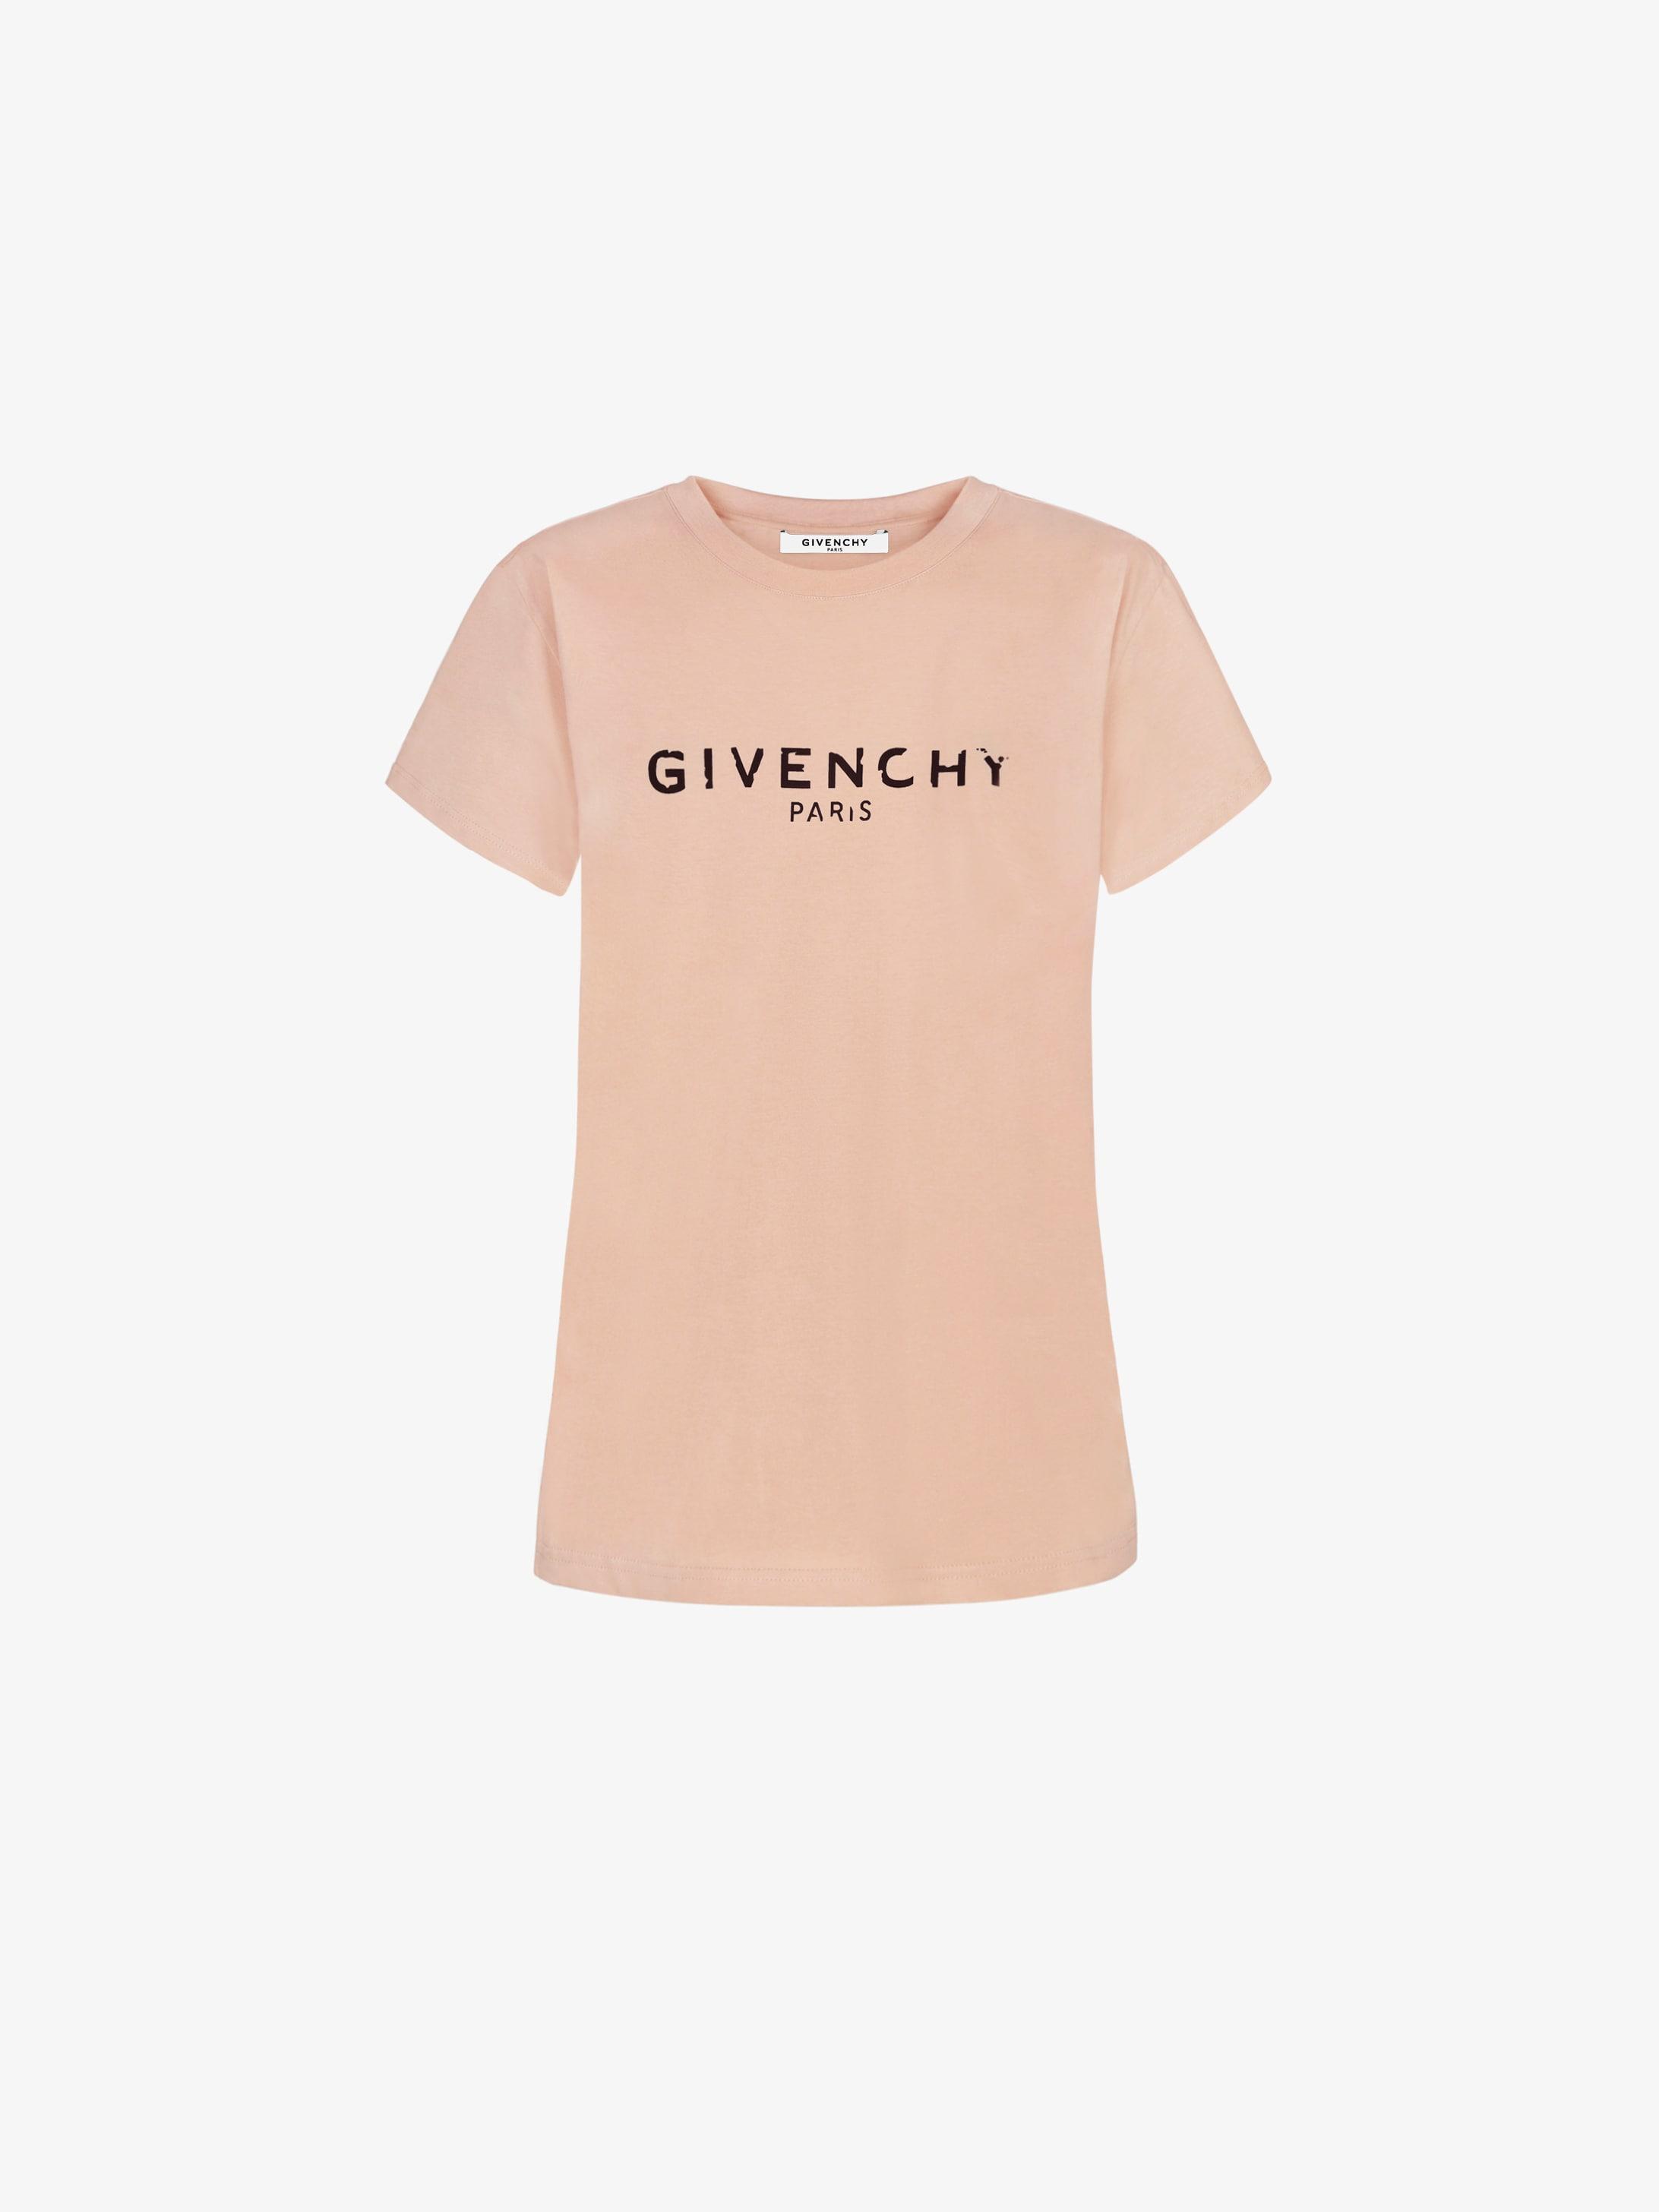 T-shirt aderente Givenchy Paris vintage